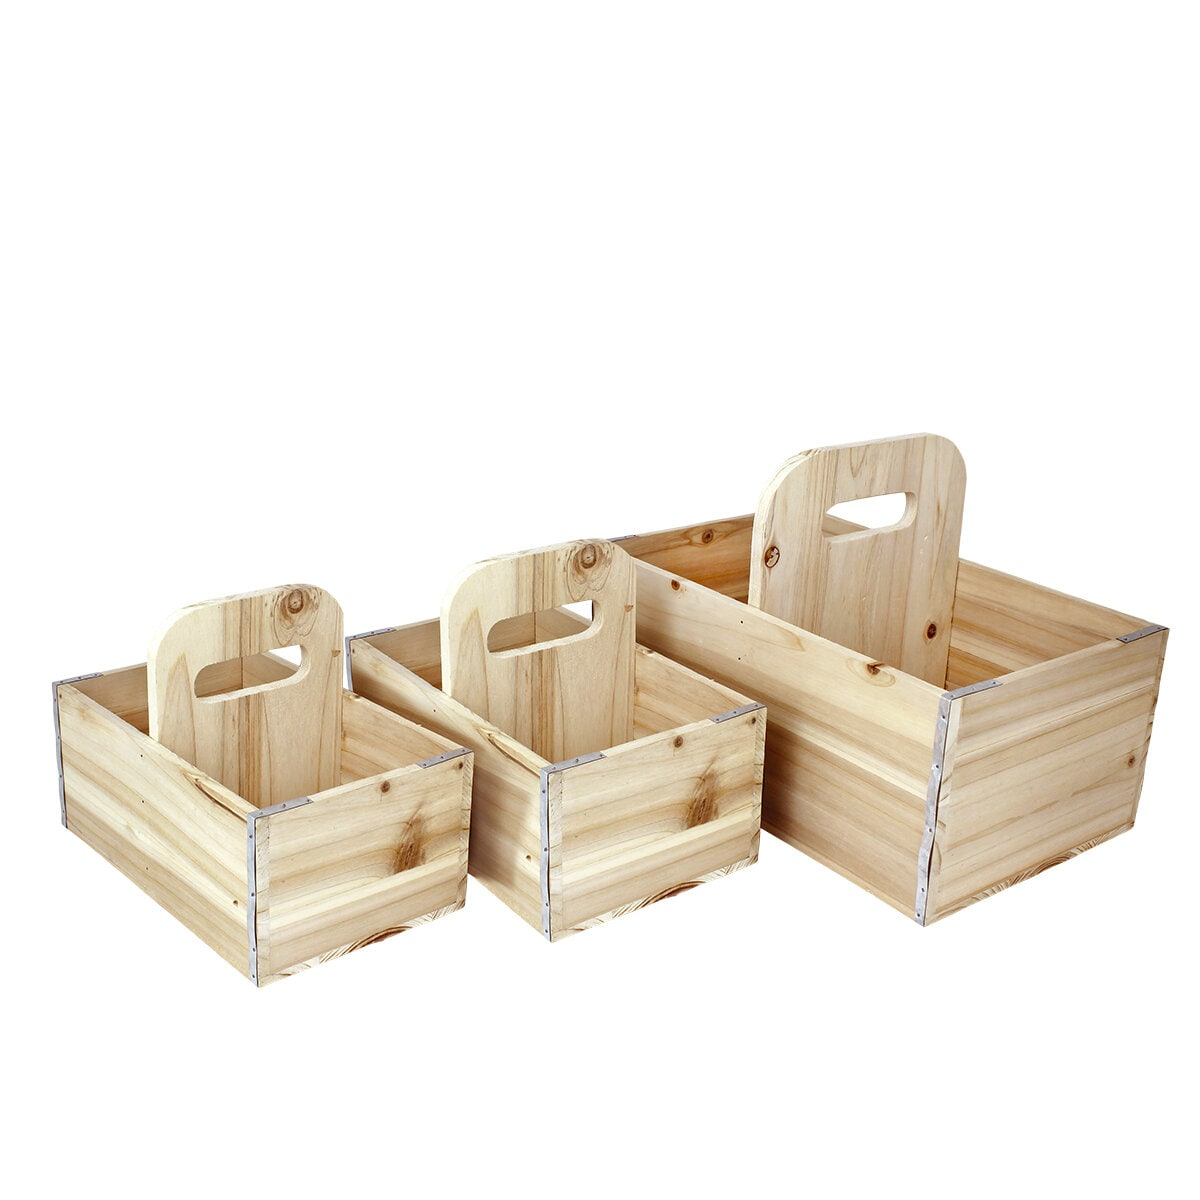 Wooden Box Arne w. Centered Handle S/3